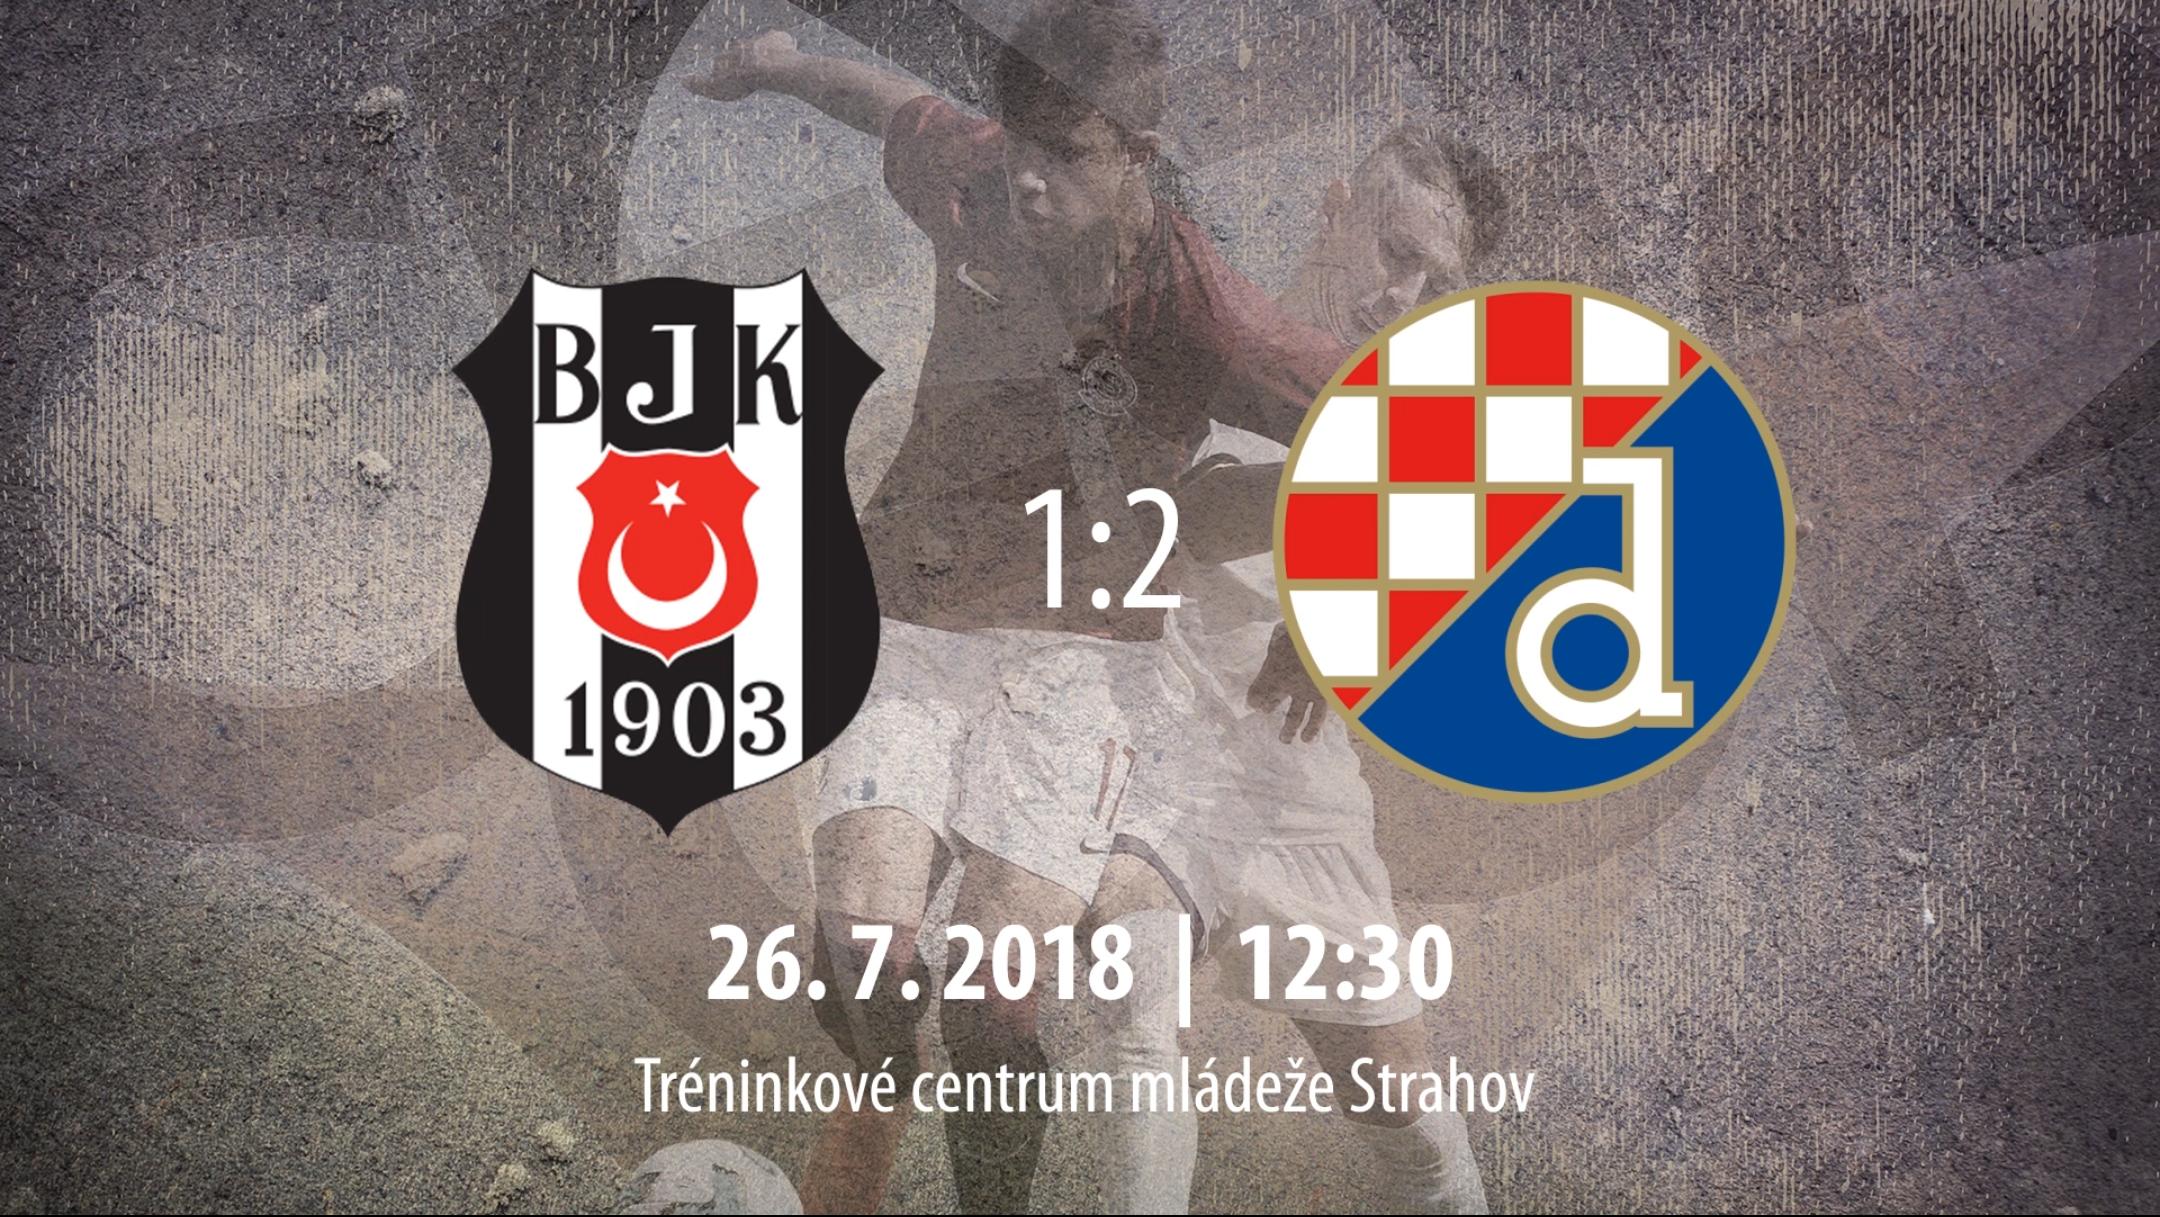 [HIGHLIGHTS] CEE Cup 2019: Beşiktaş JK vs GNK Dinamo Zagreb 1-2